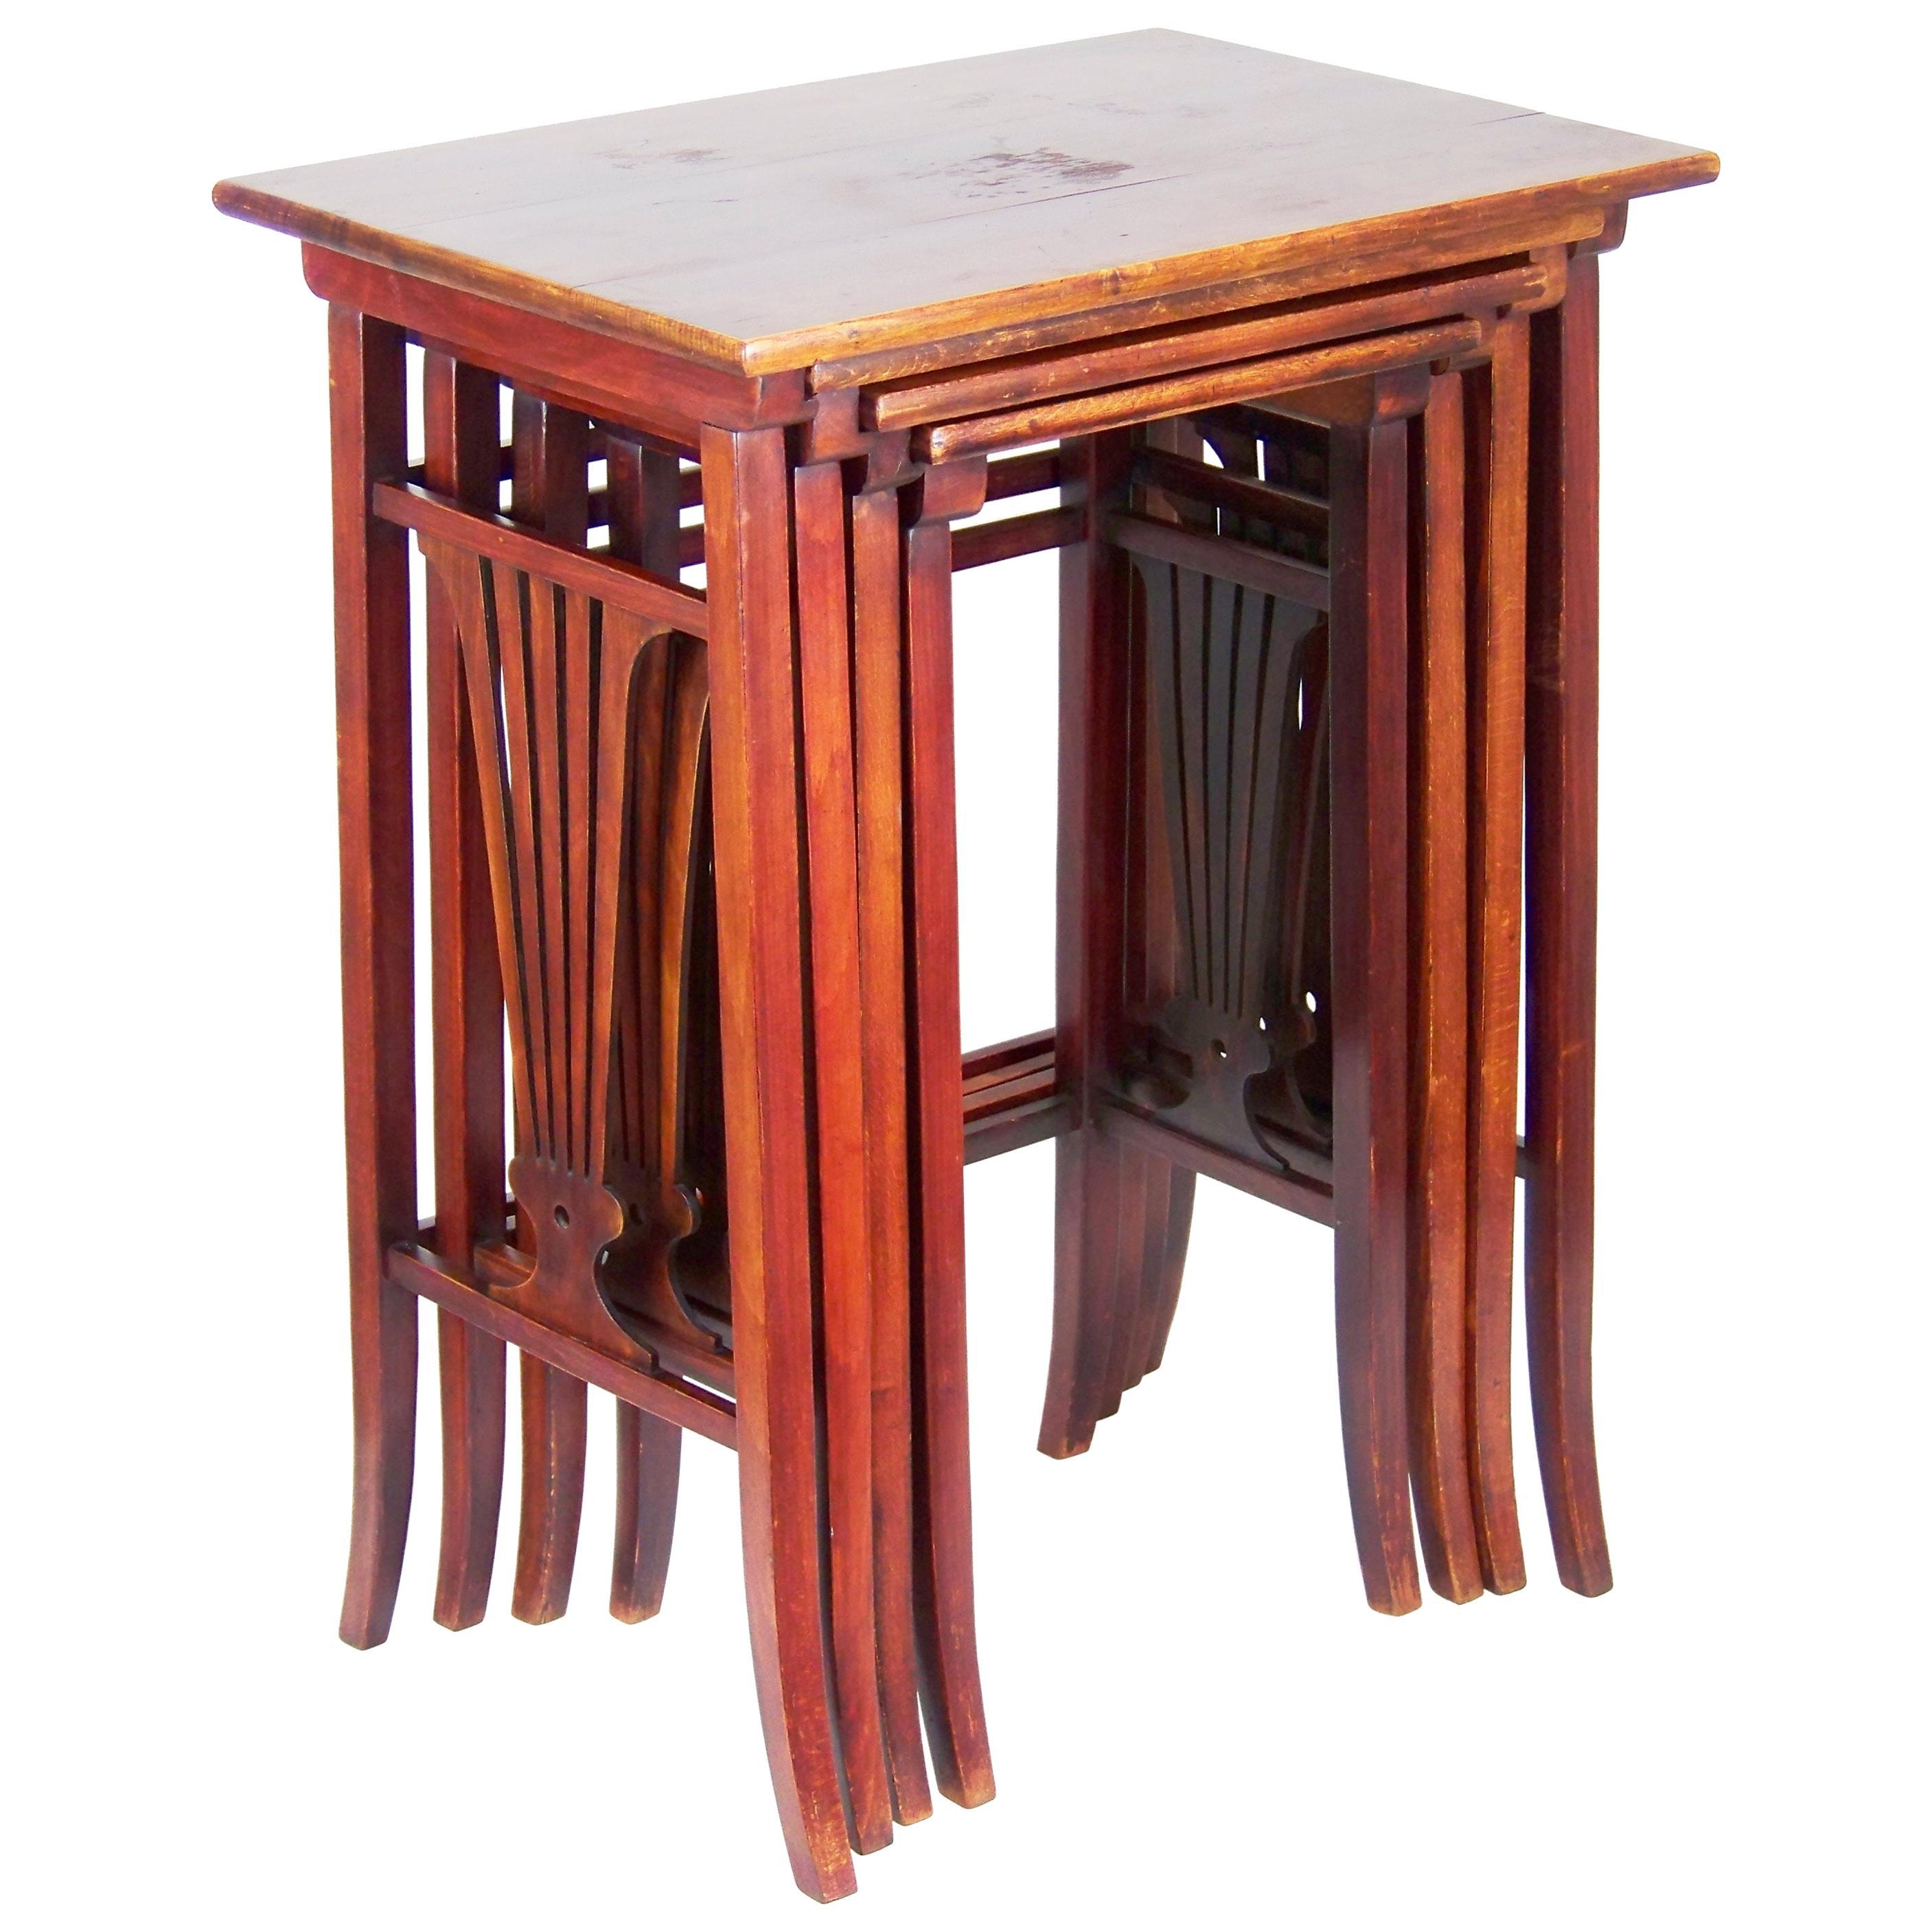 Nesting Tables Thonet Nr.21, Since 1907